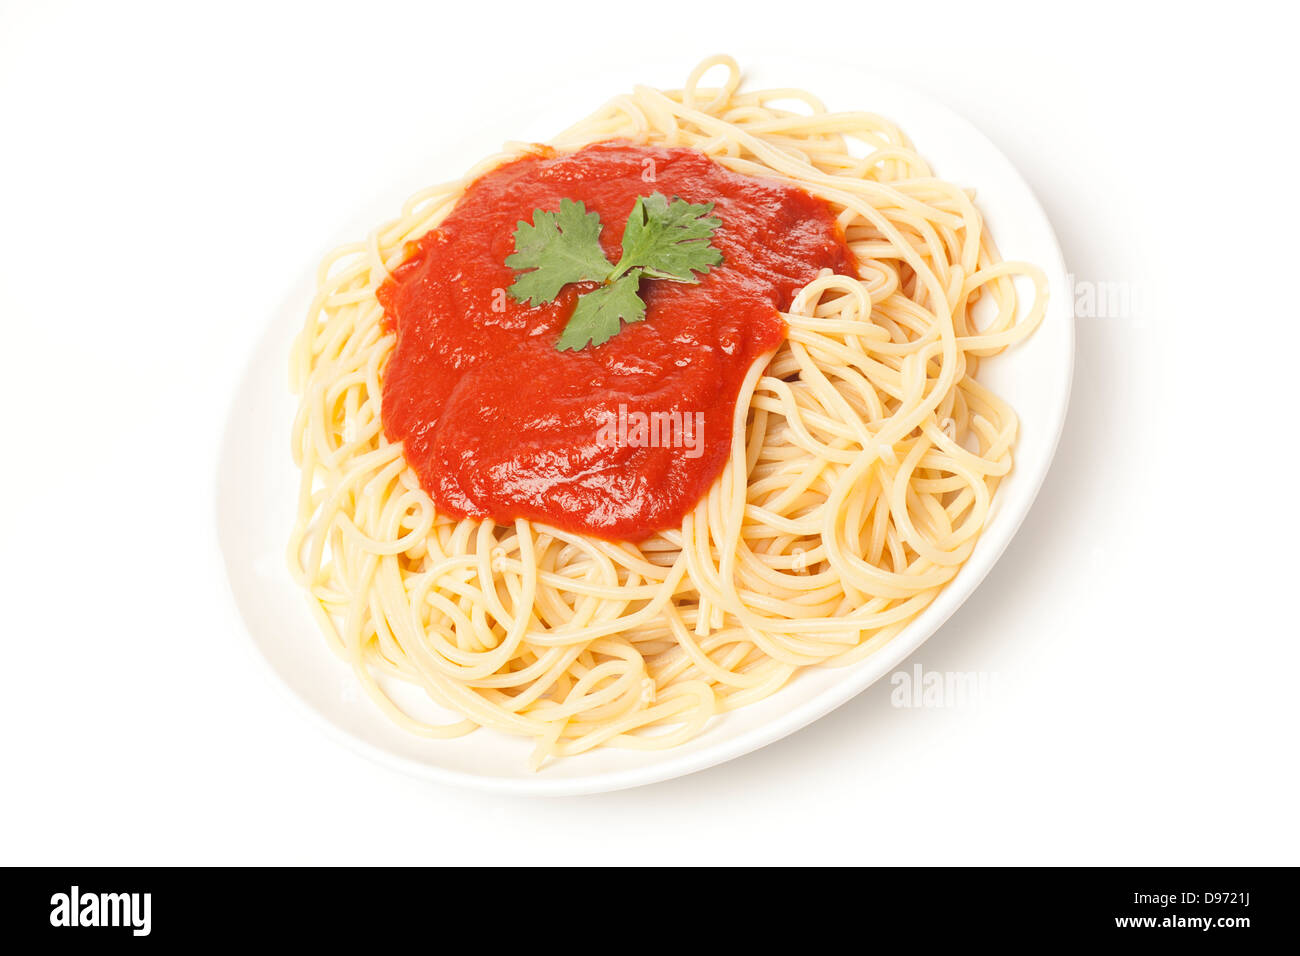 Organic Whole Grain Pasta with tomato sauce - Stock Image